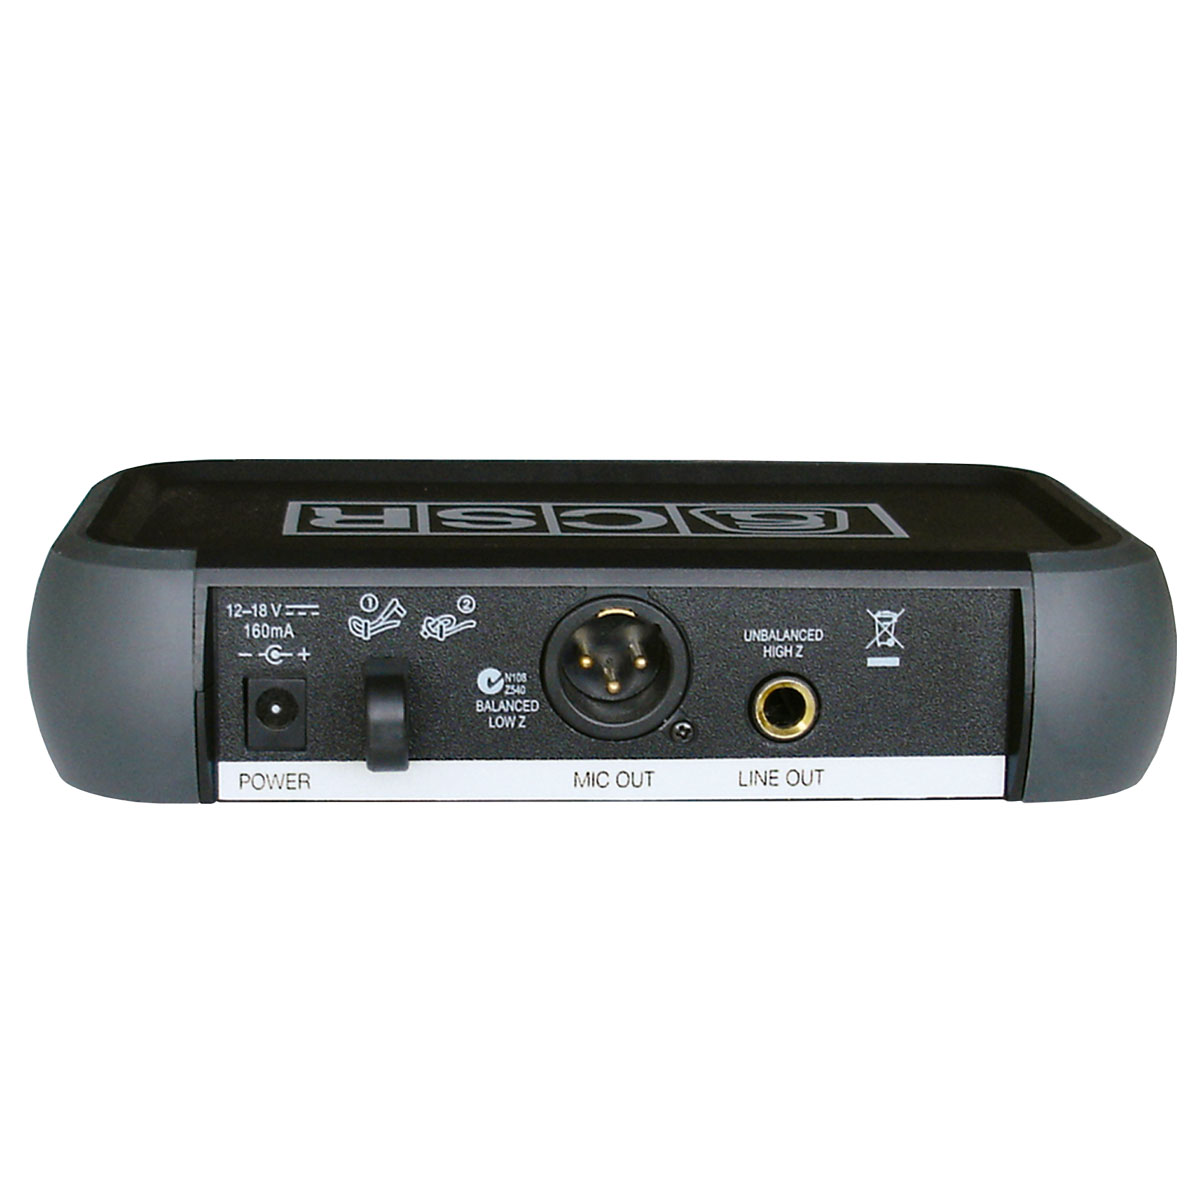 X888 - Microfone s/ Fio de Mão UHF X 888 - CSR